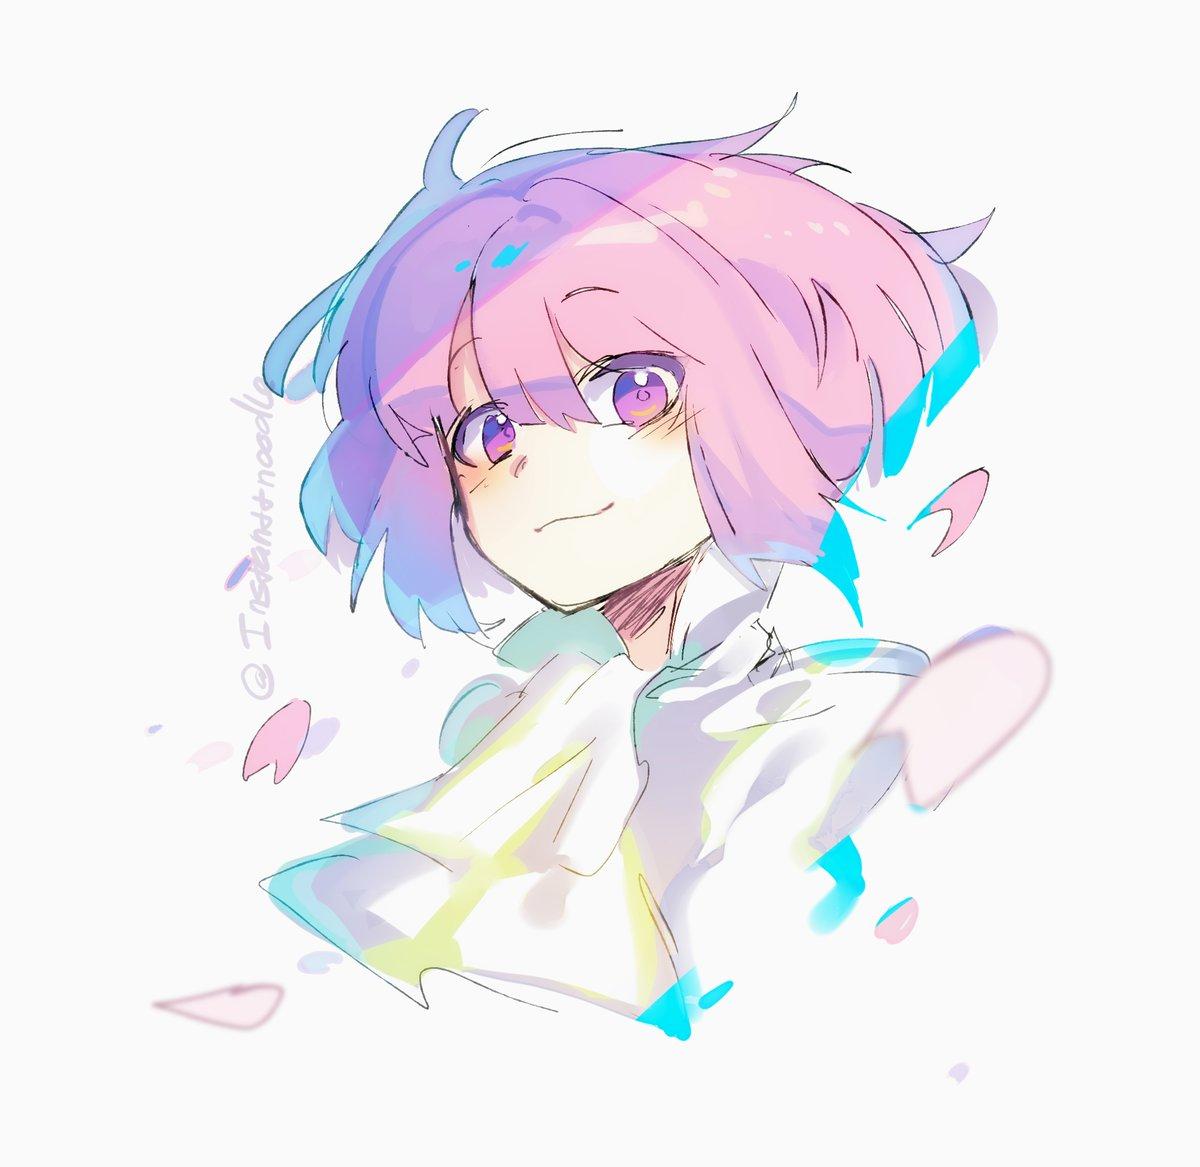 [doodle] 🌸sakura lio🌸